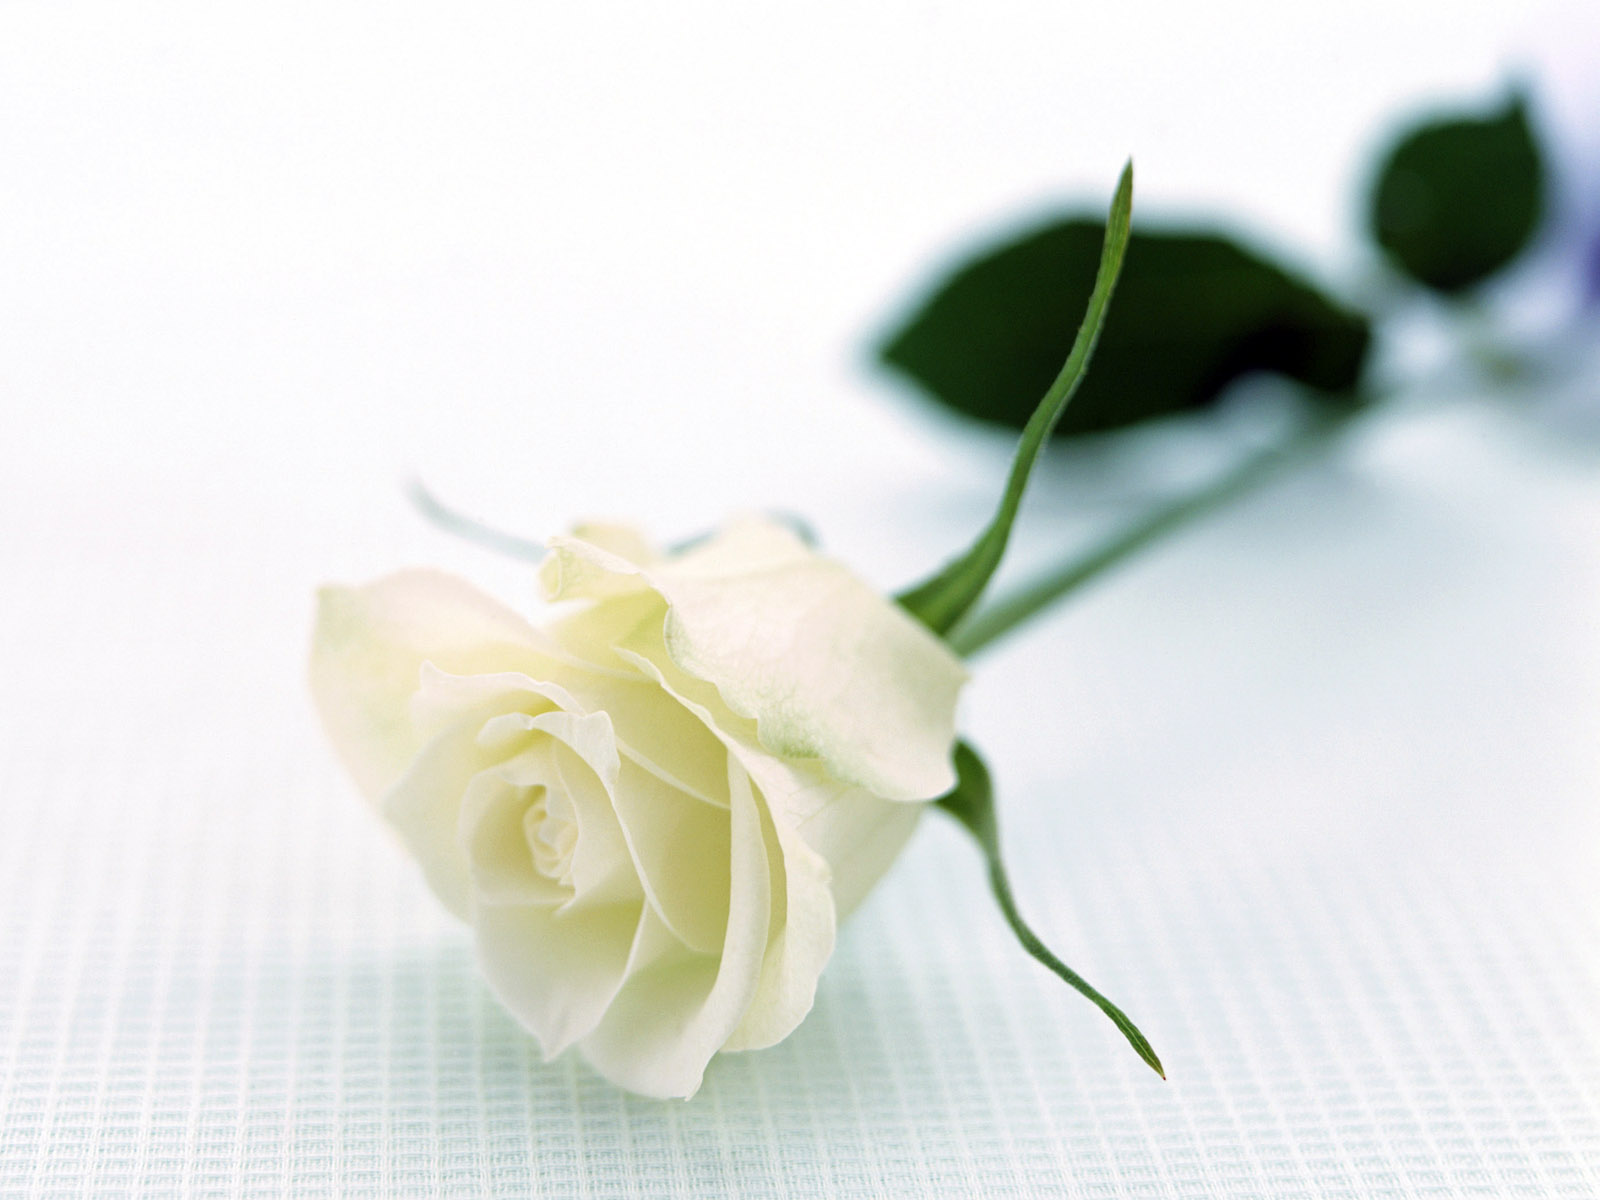 http://2.bp.blogspot.com/-60XMZsmb5k0/UPvzFYEETVI/AAAAAAAANus/jBgraDeQU9k/s1600/White+Flower+Wallpaper.jpg